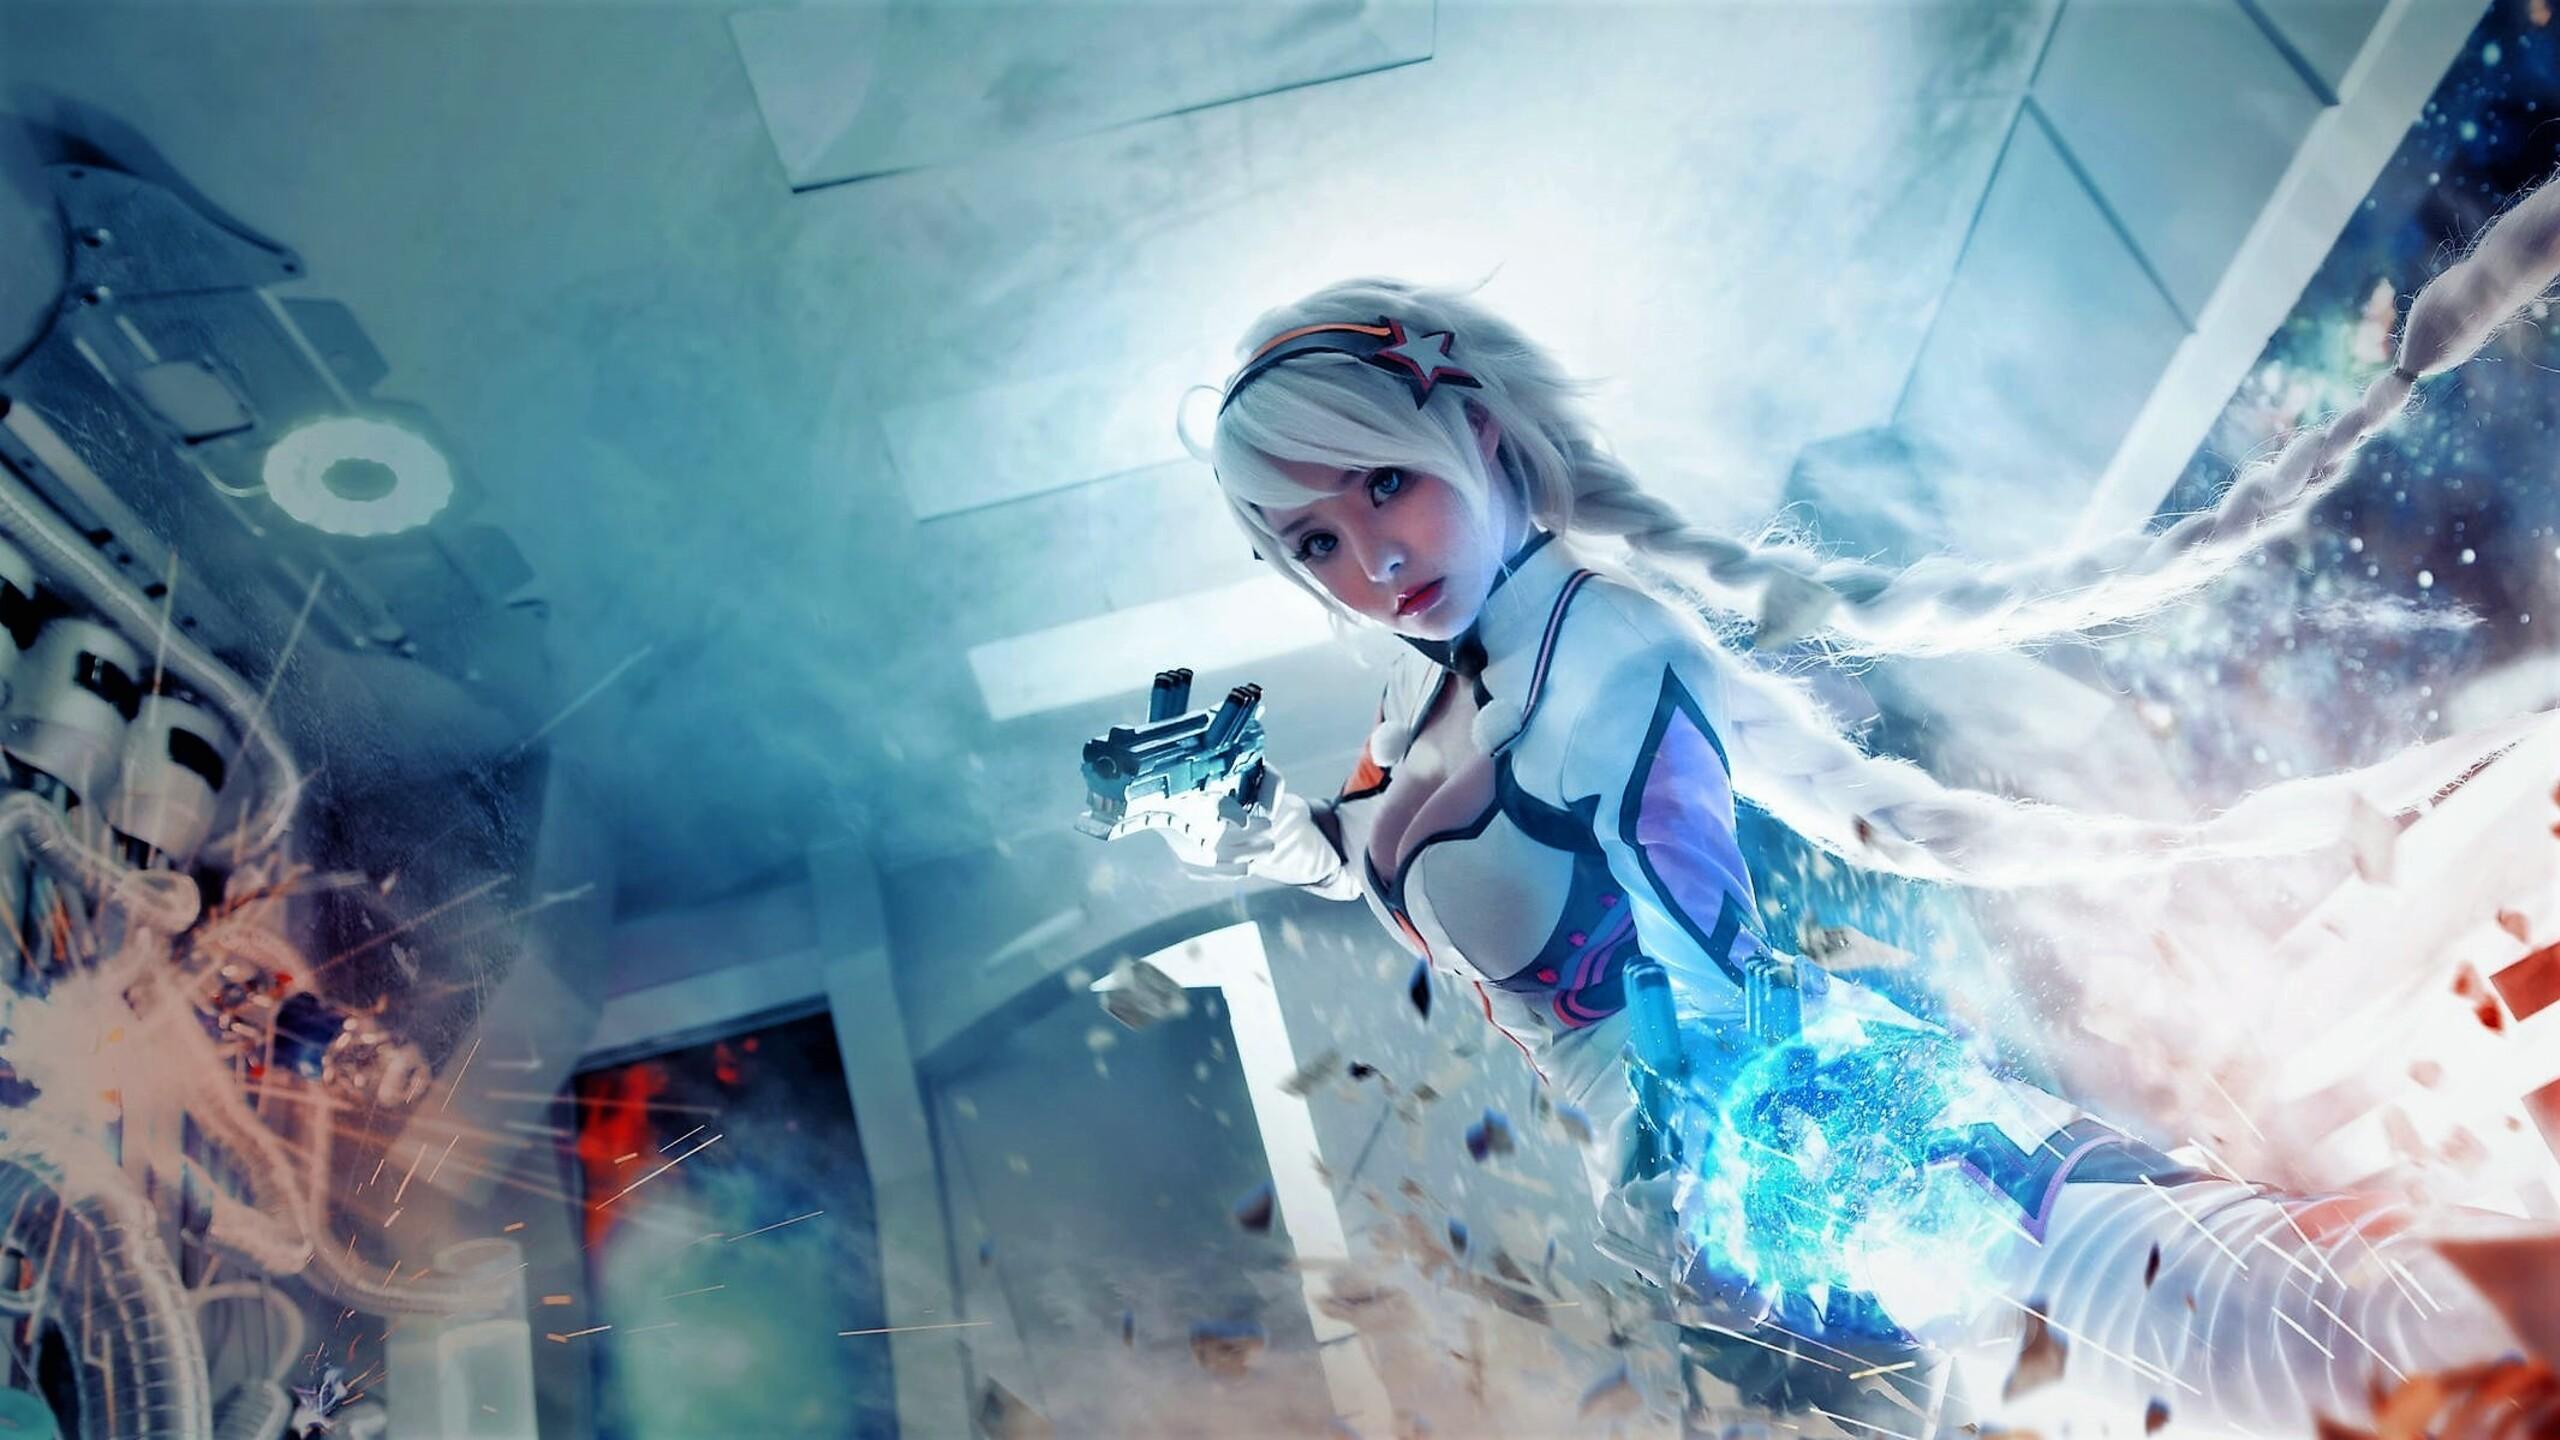 2560x1440 Fantasy Girl Futuristic Warrior Women 1440p Resolution